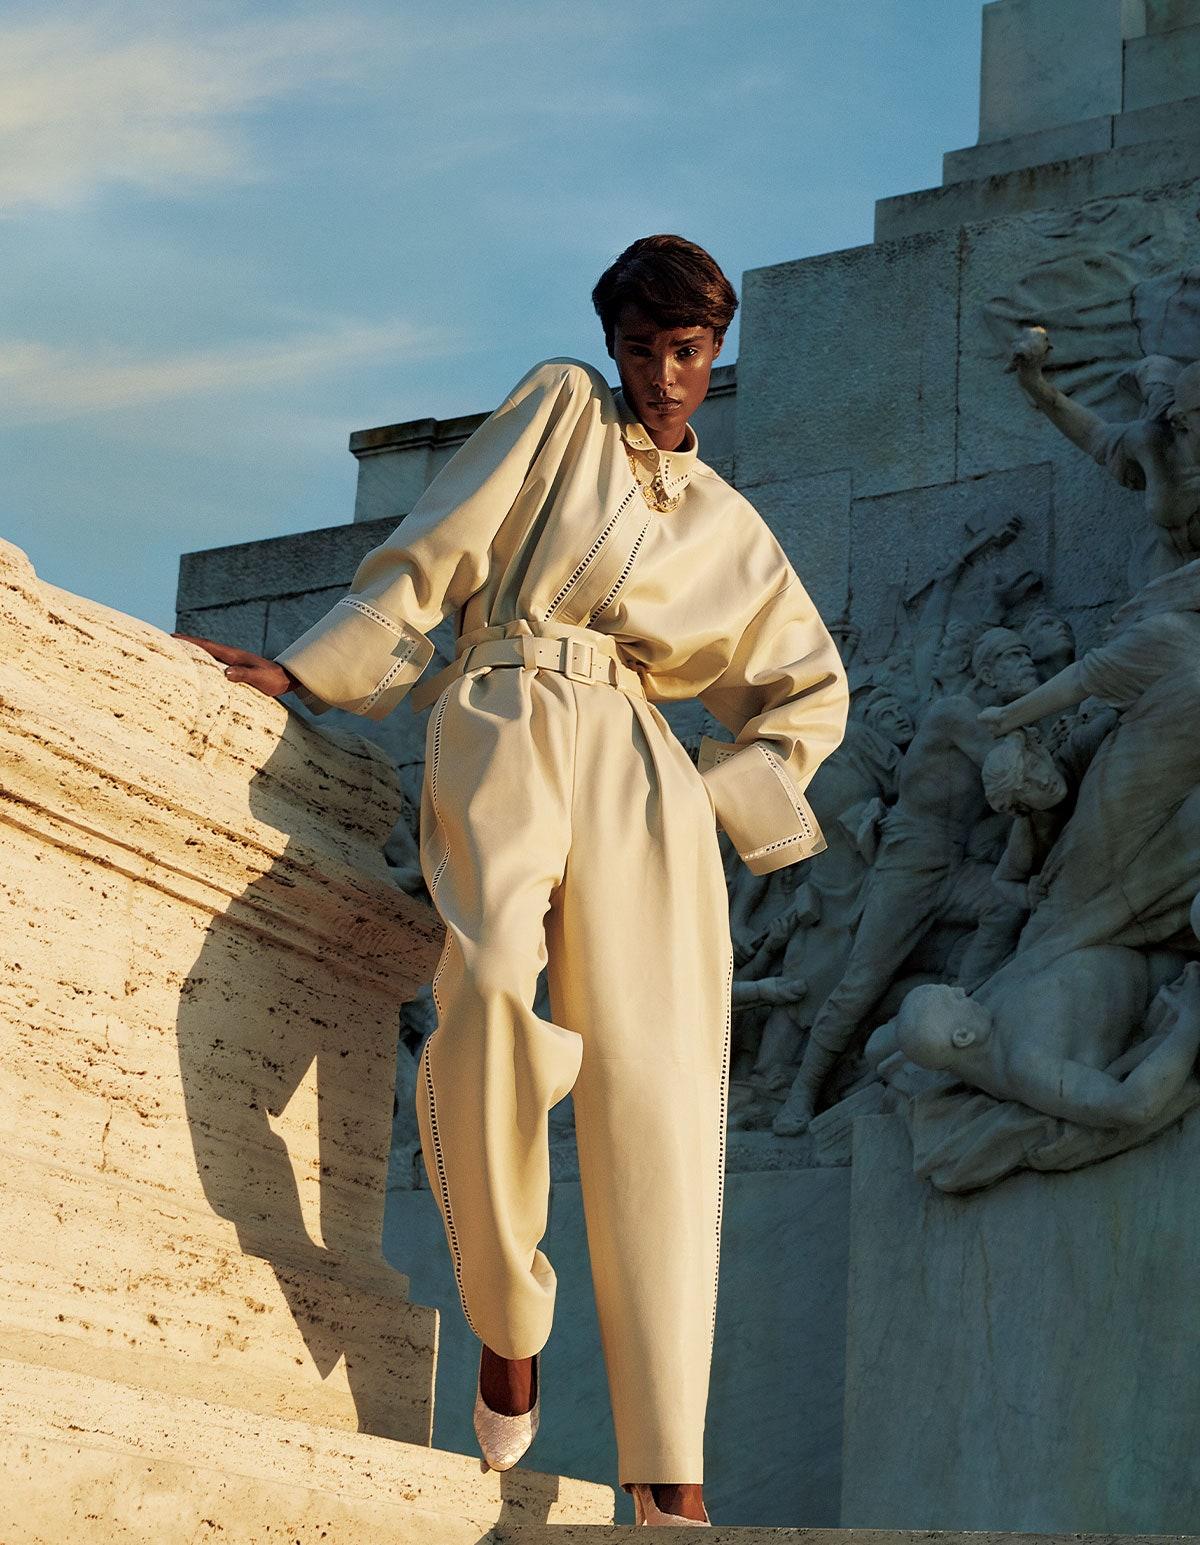 Malika Louback in Vogue Japan September 2021 by Camilla Akrans